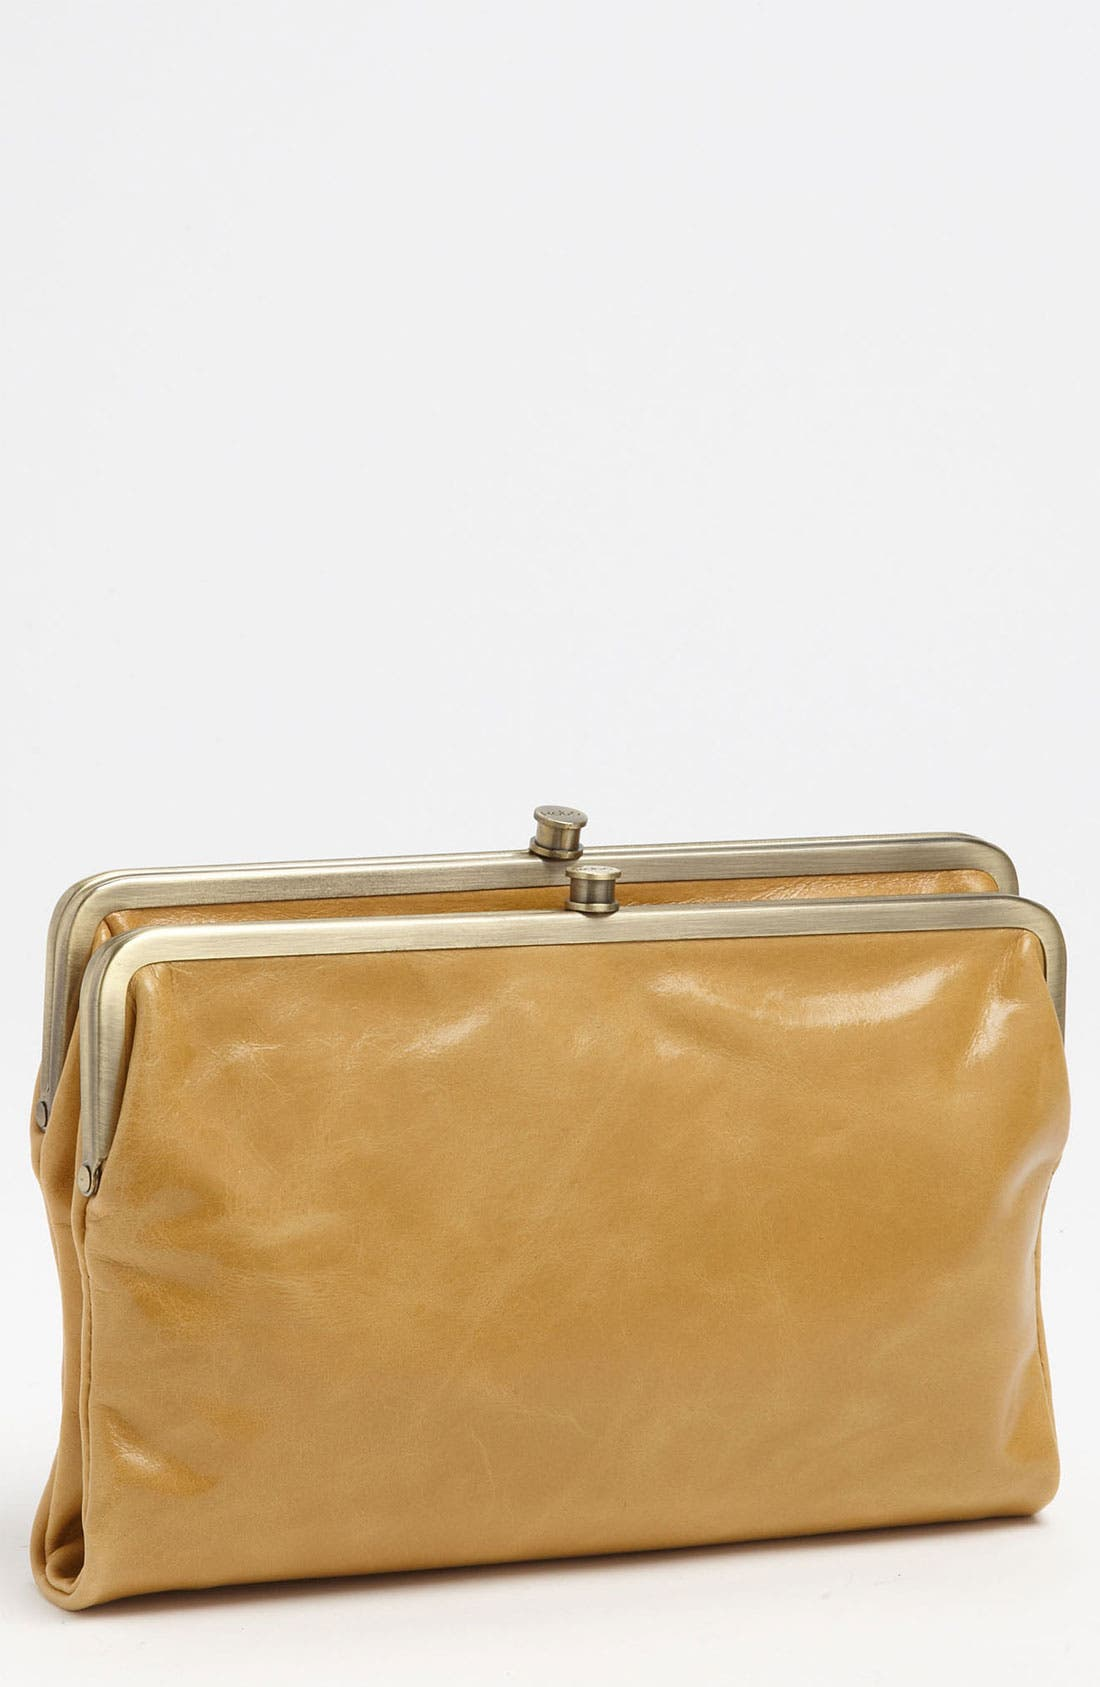 Main Image - Hobo 'Vintage Leanne' Leather Crossbody Bag